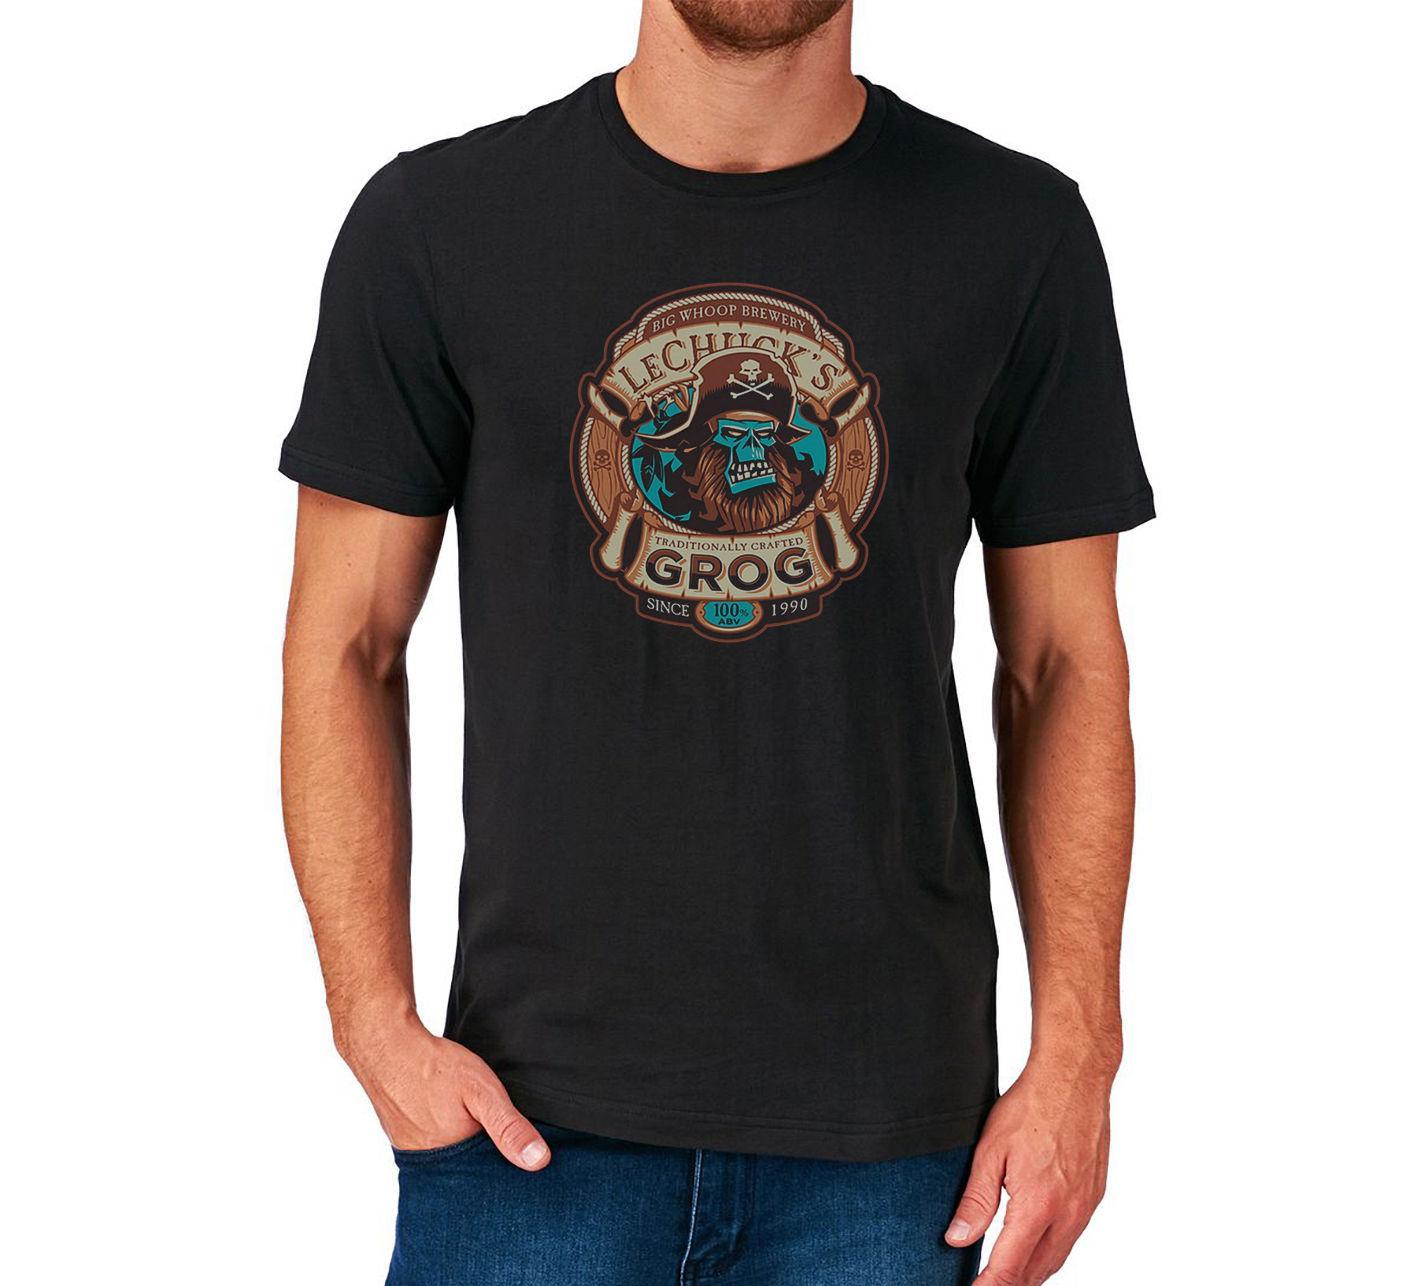 Grog T Shirt Monkey Island Pirate New Fashion Men's T-shirt Cool Summer Tees